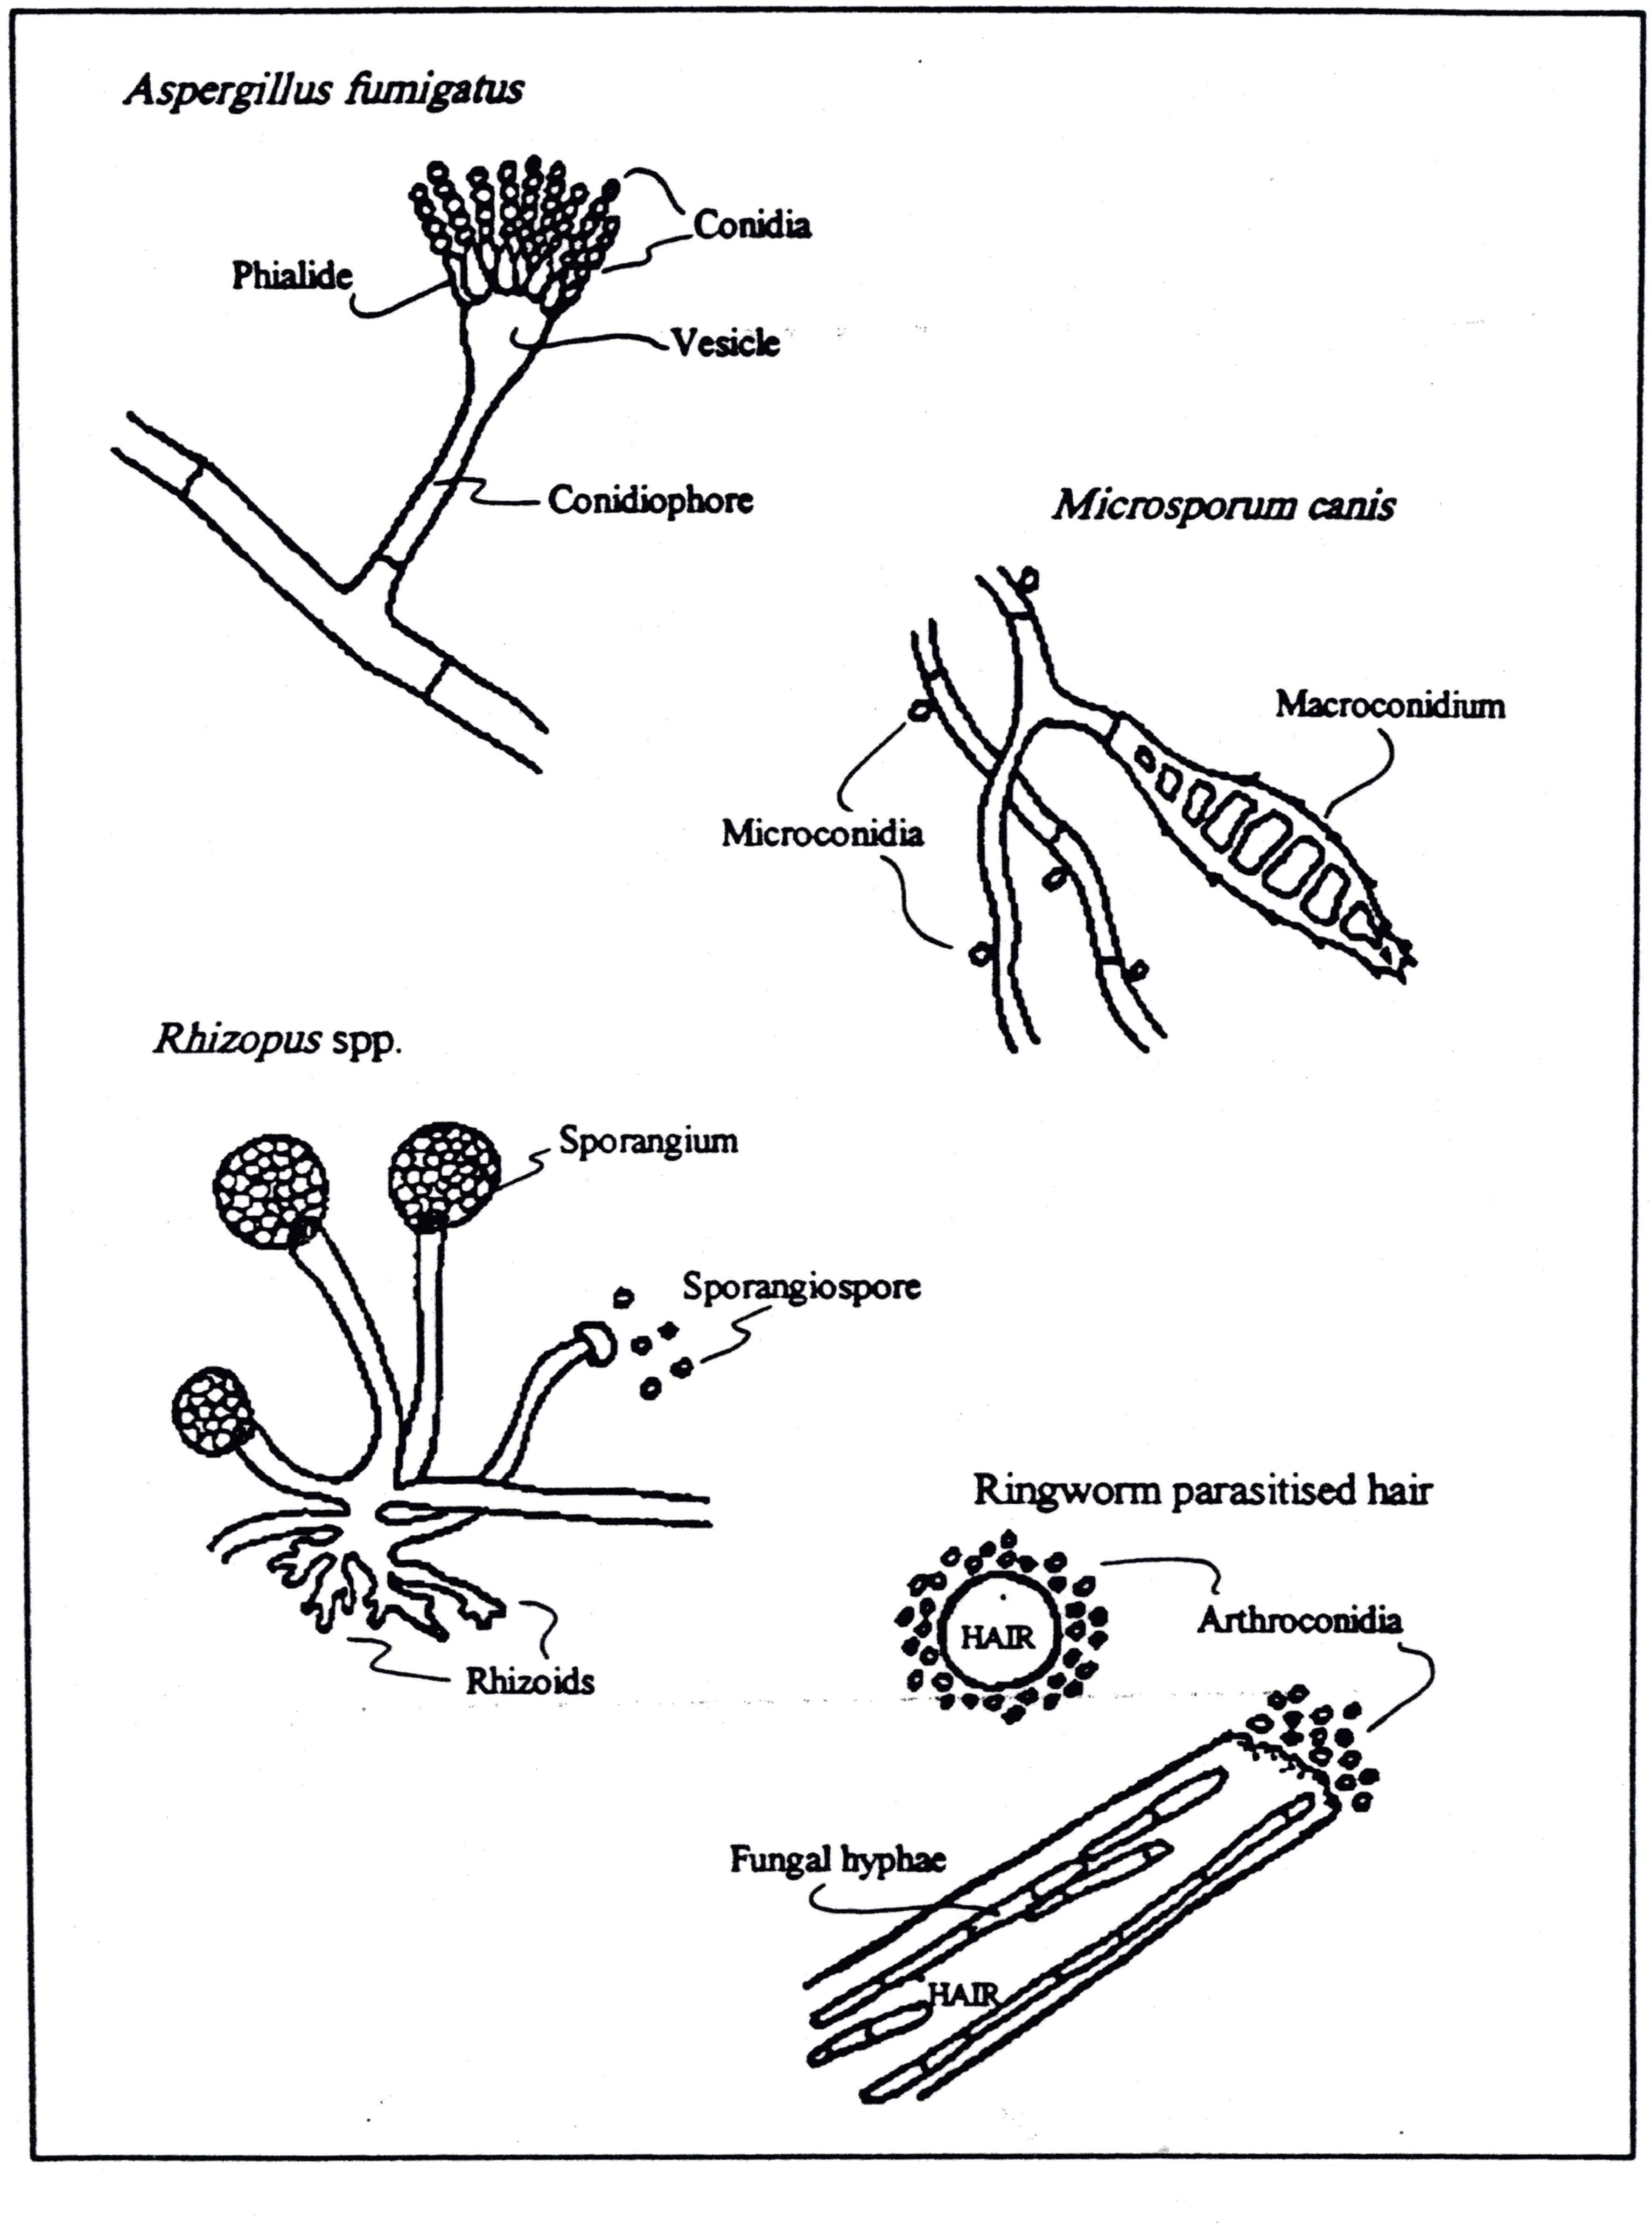 Pin By Nathaniel Hannemann On Fungi